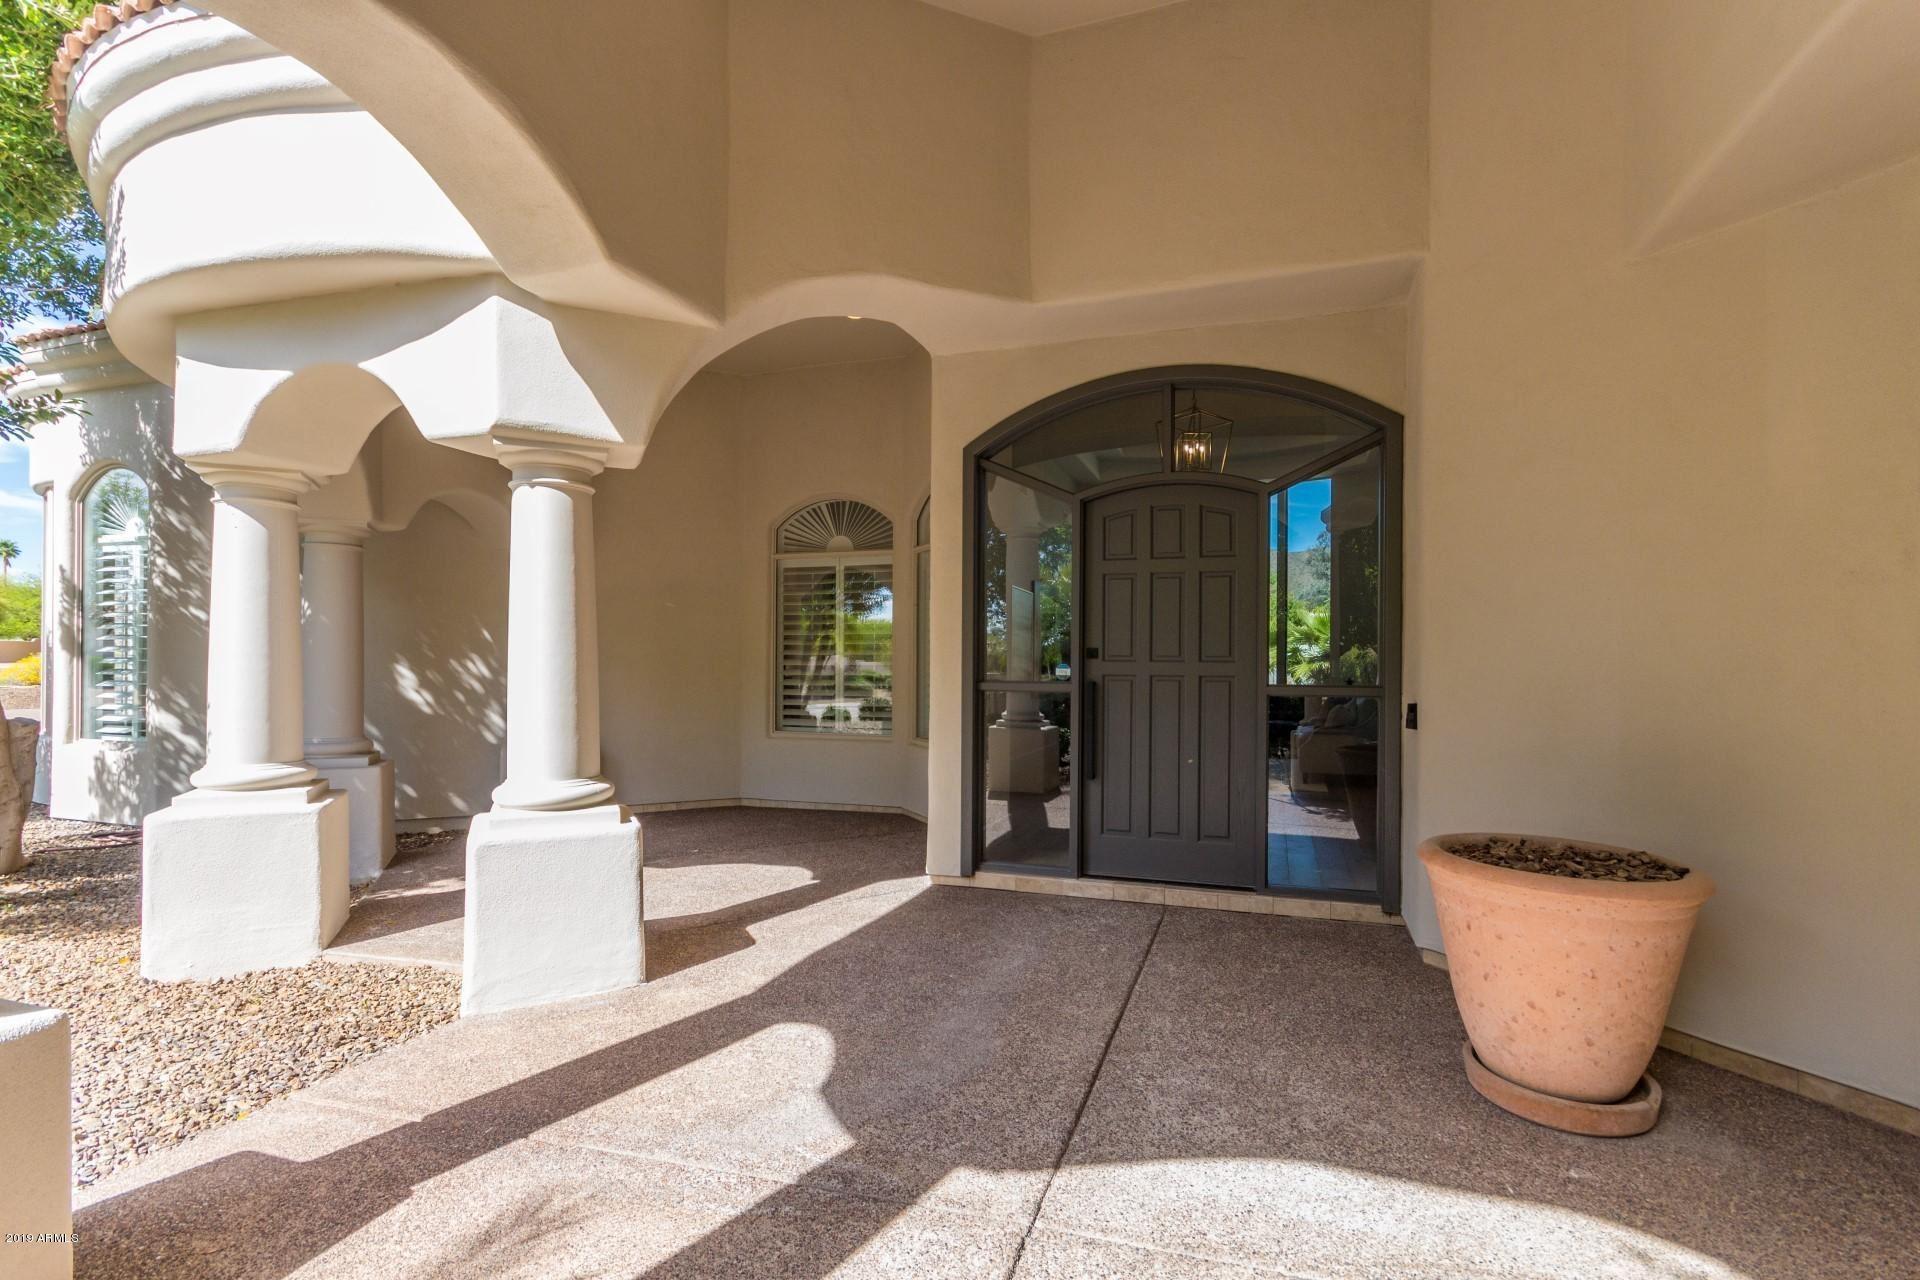 Photo of 10686 E LAUREL Lane, Scottsdale, AZ 85259 (MLS # 6245950)